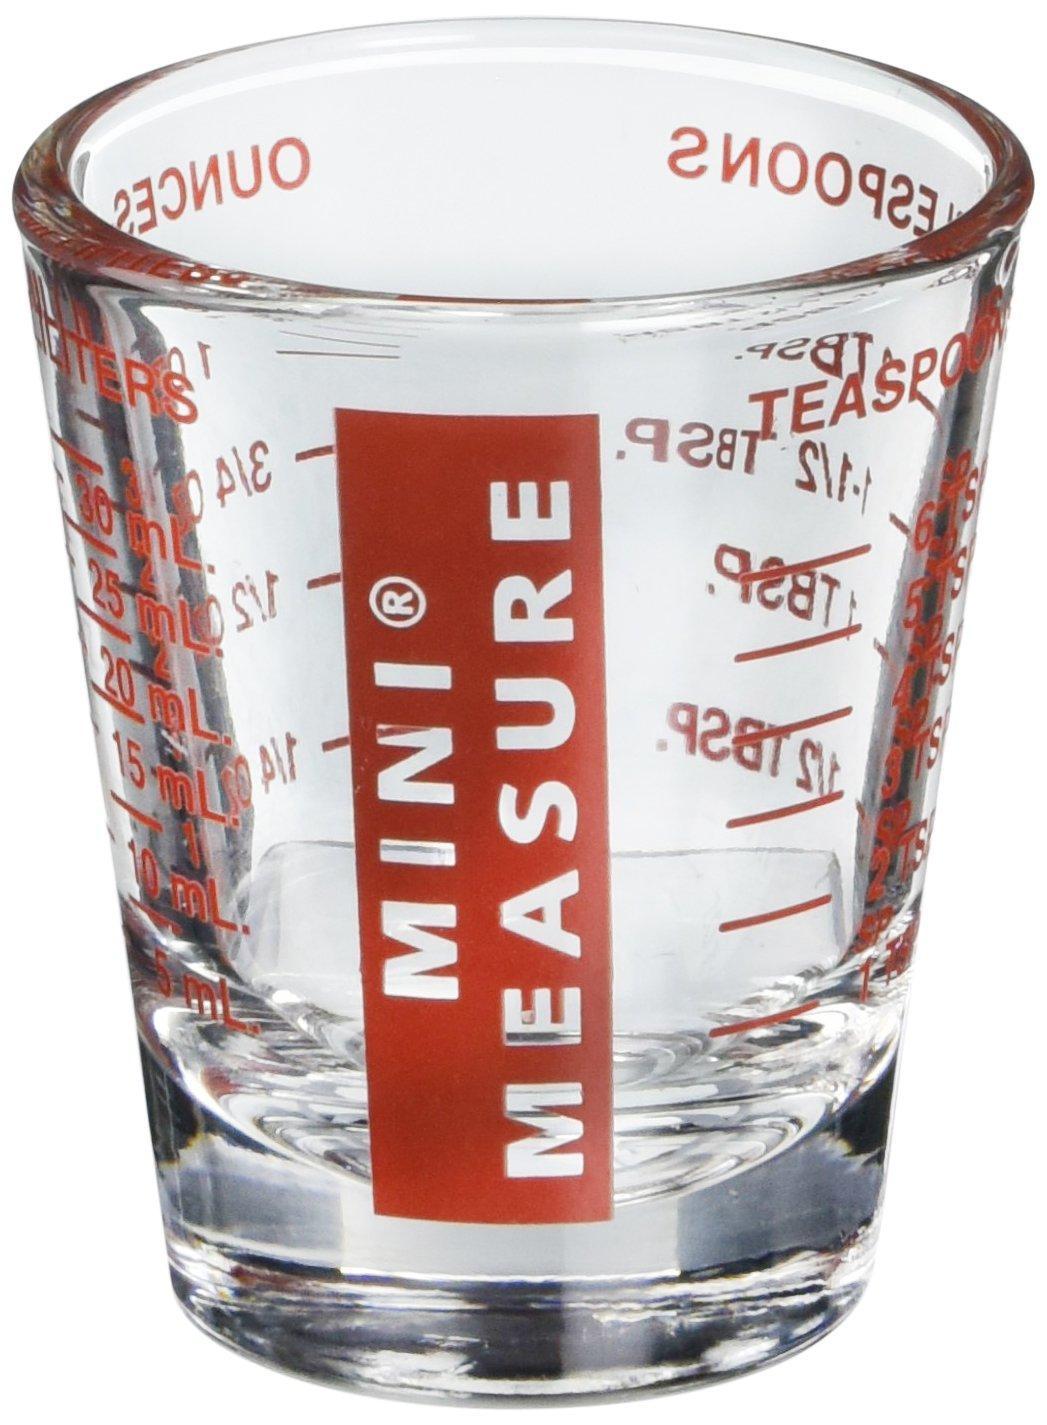 Eddingtons Mini Measure Glass Kolder 13211 Measuring Tools Tools_Gadgets_and_Barware